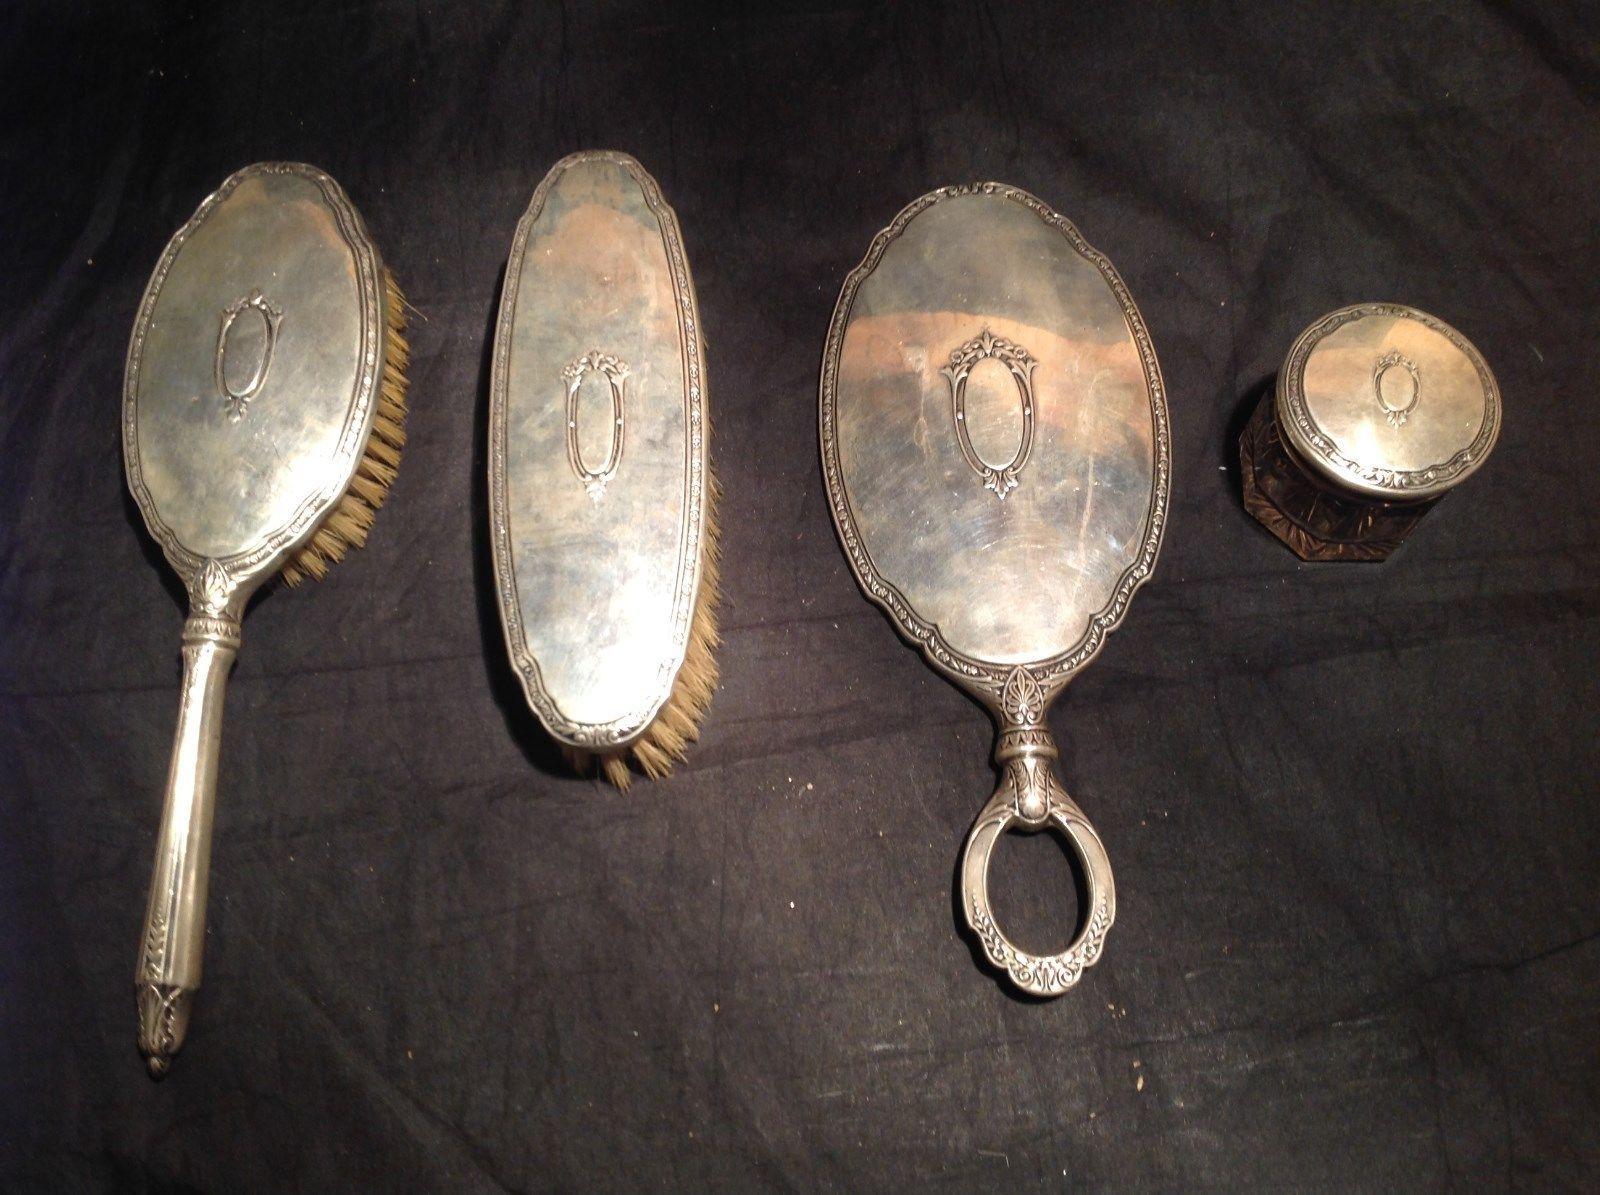 Vintage 4 Pieces Hairbrush Mirror Glass Jar Body Brush Bathroom Set Silverplate